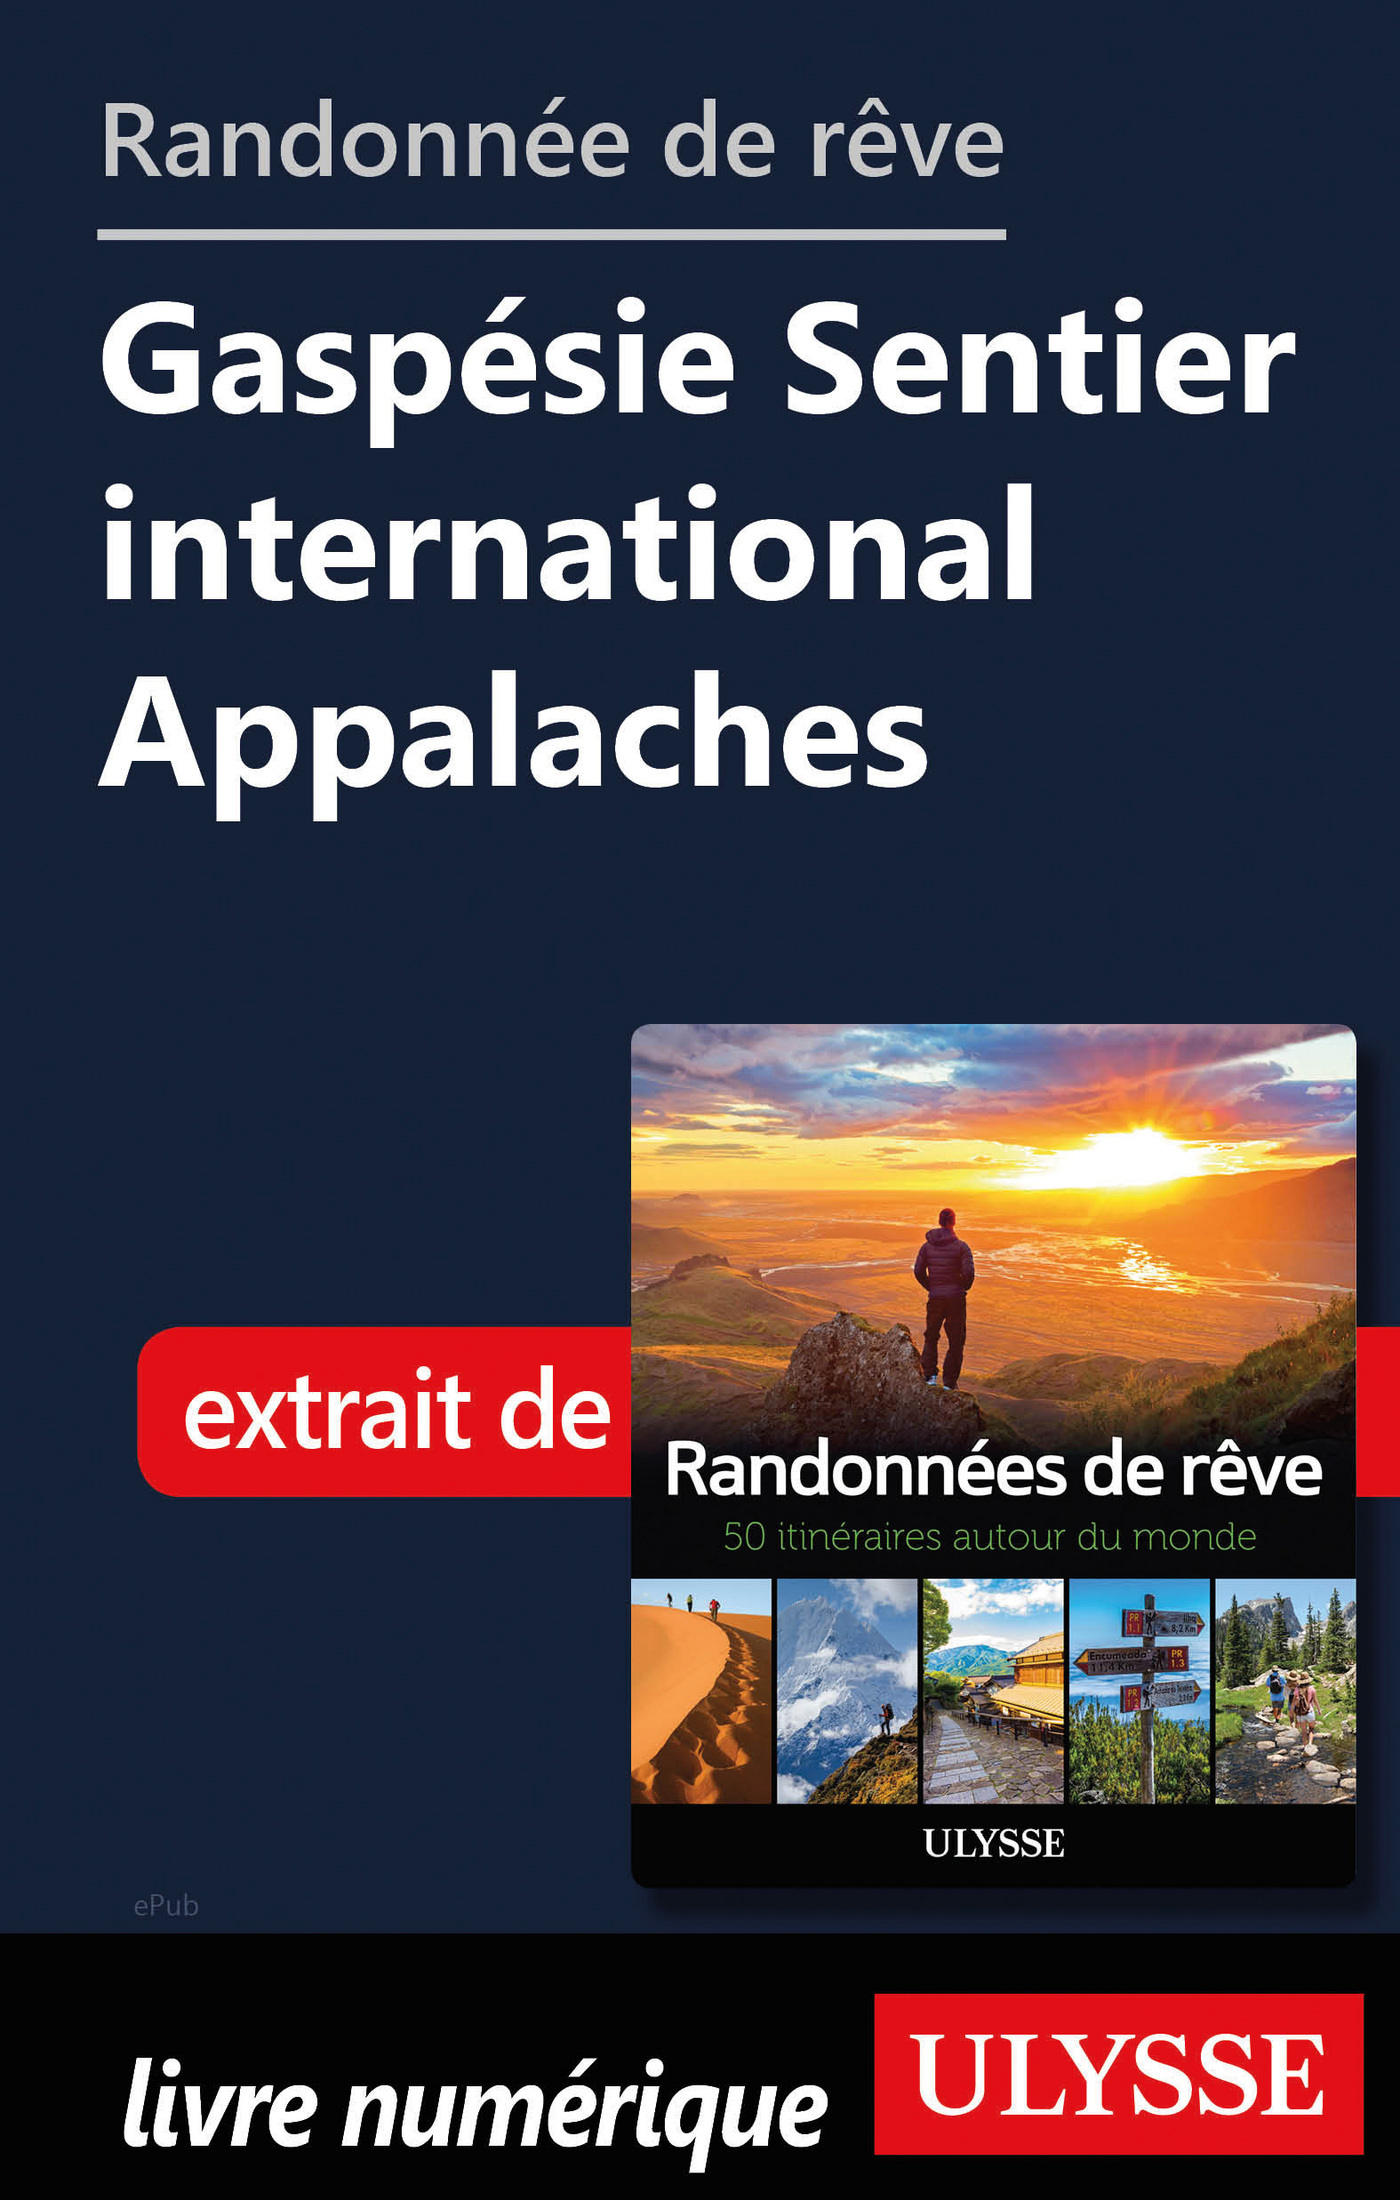 Randonnée de rêve - Gaspésie Sentier international Appalaches